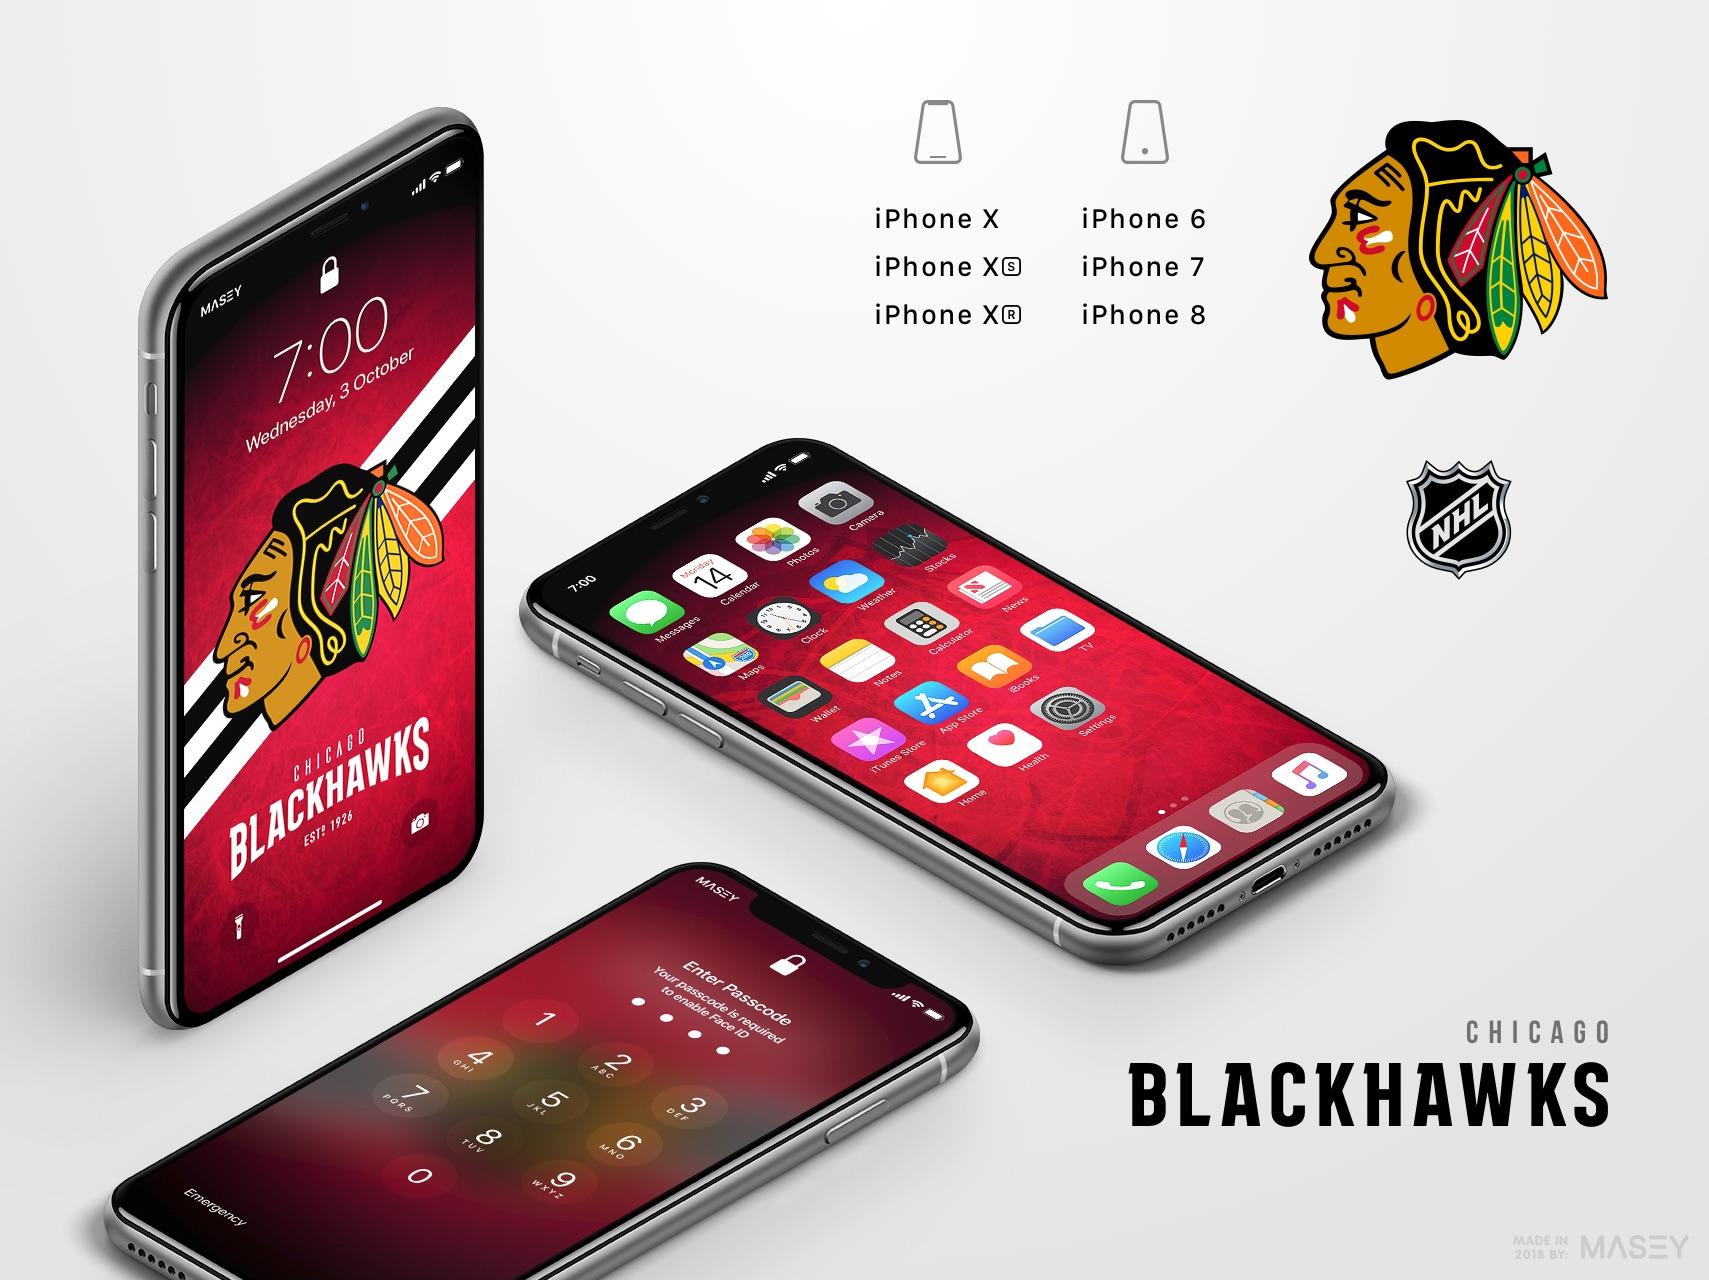 Chicago Blackhawks iPhone Wallpaper